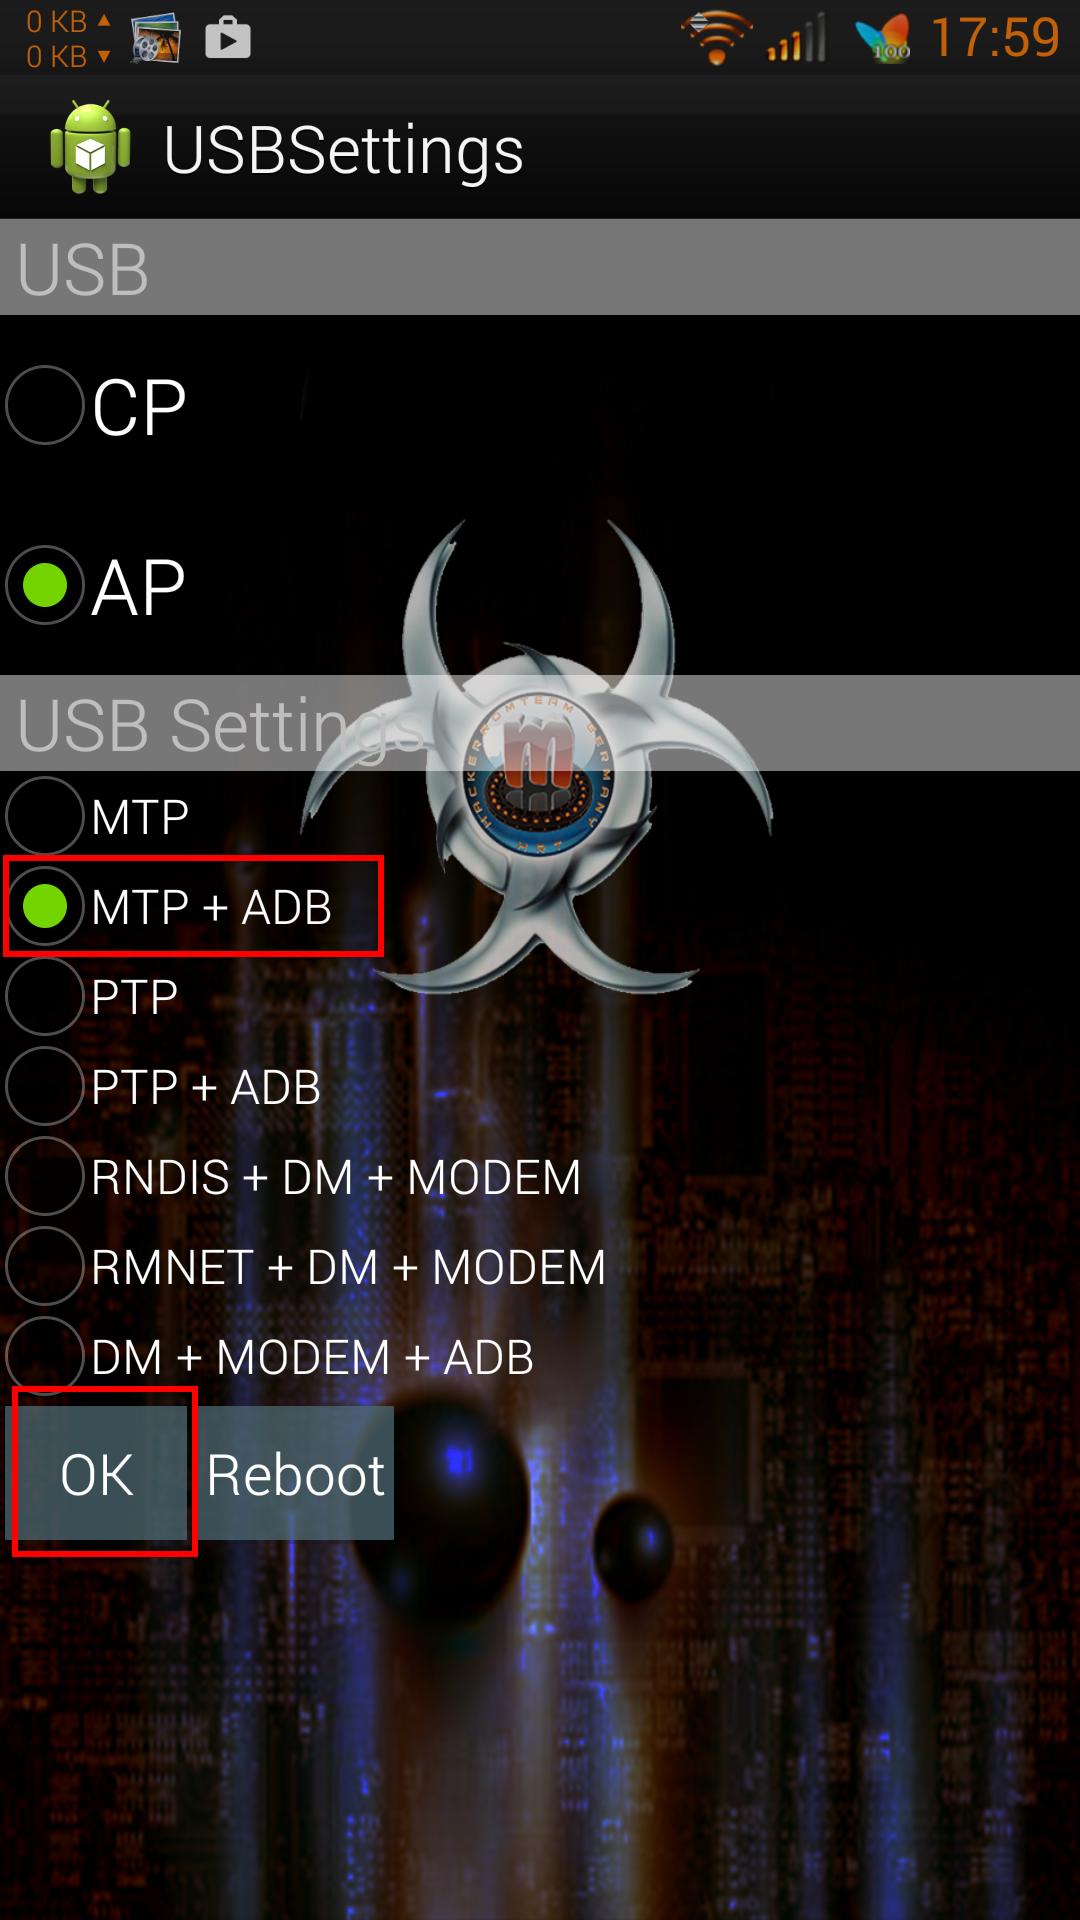 [Anleitungen] Erstellen eines EFS/NV Data Backup - Galaxy Note 4-screenshot_2014-11-05-17-59-21.png